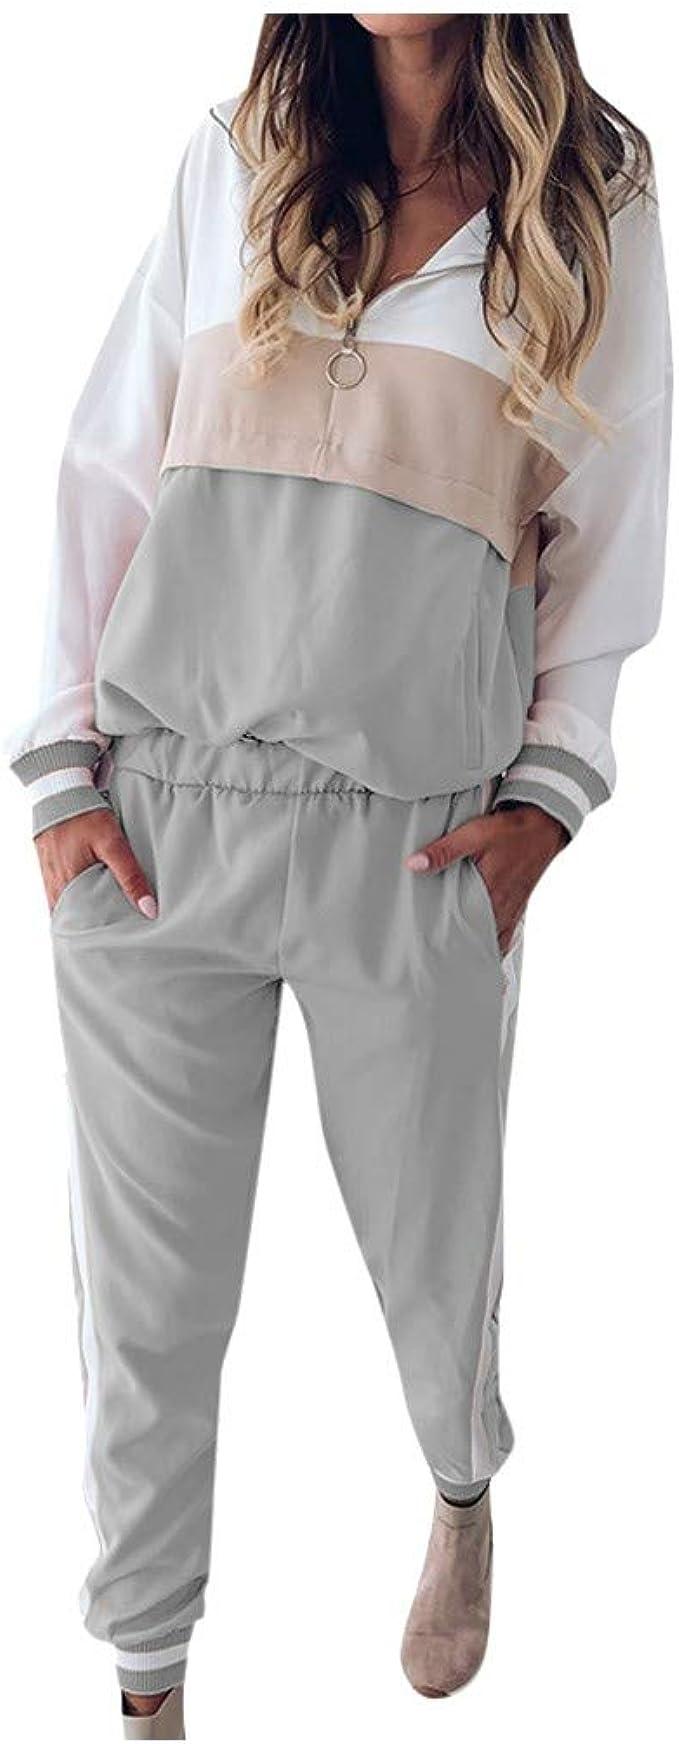 Conjuntos Mujer Chandal, Tops Deportivos Mujer Fitness, Pantalones ...